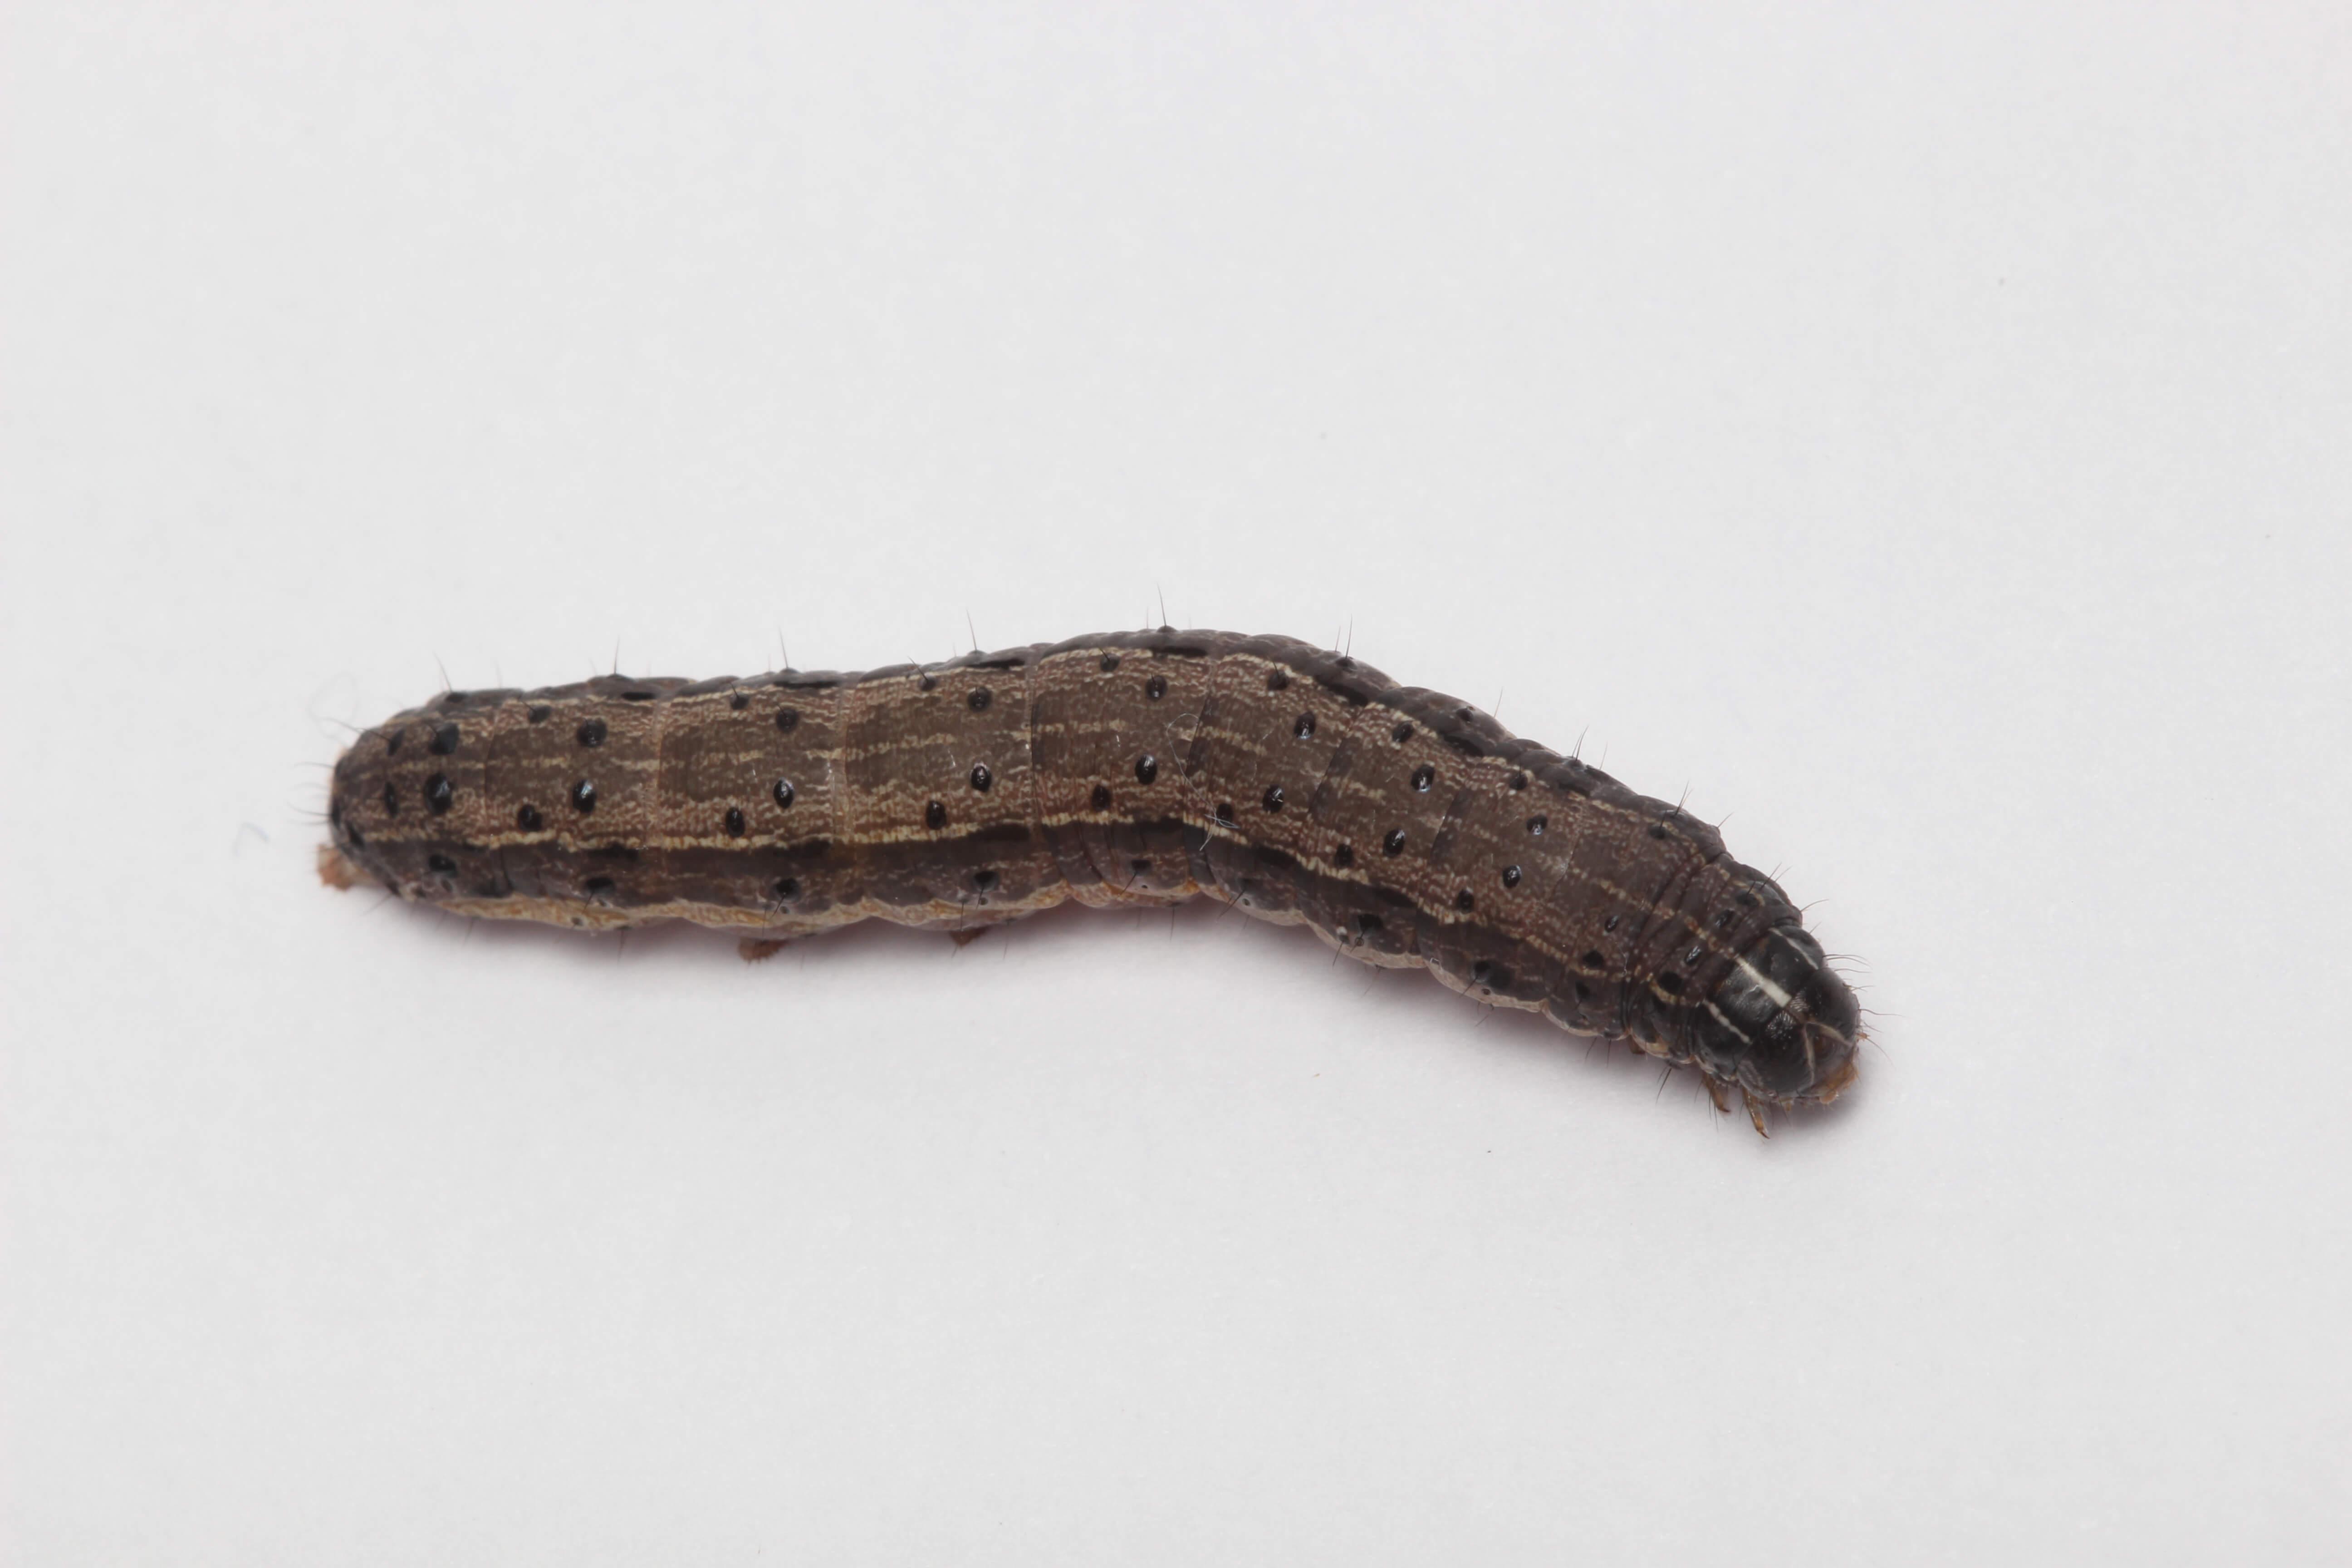 S frugiperda 13 - Pragas do milho: Spodoptera frugiperda